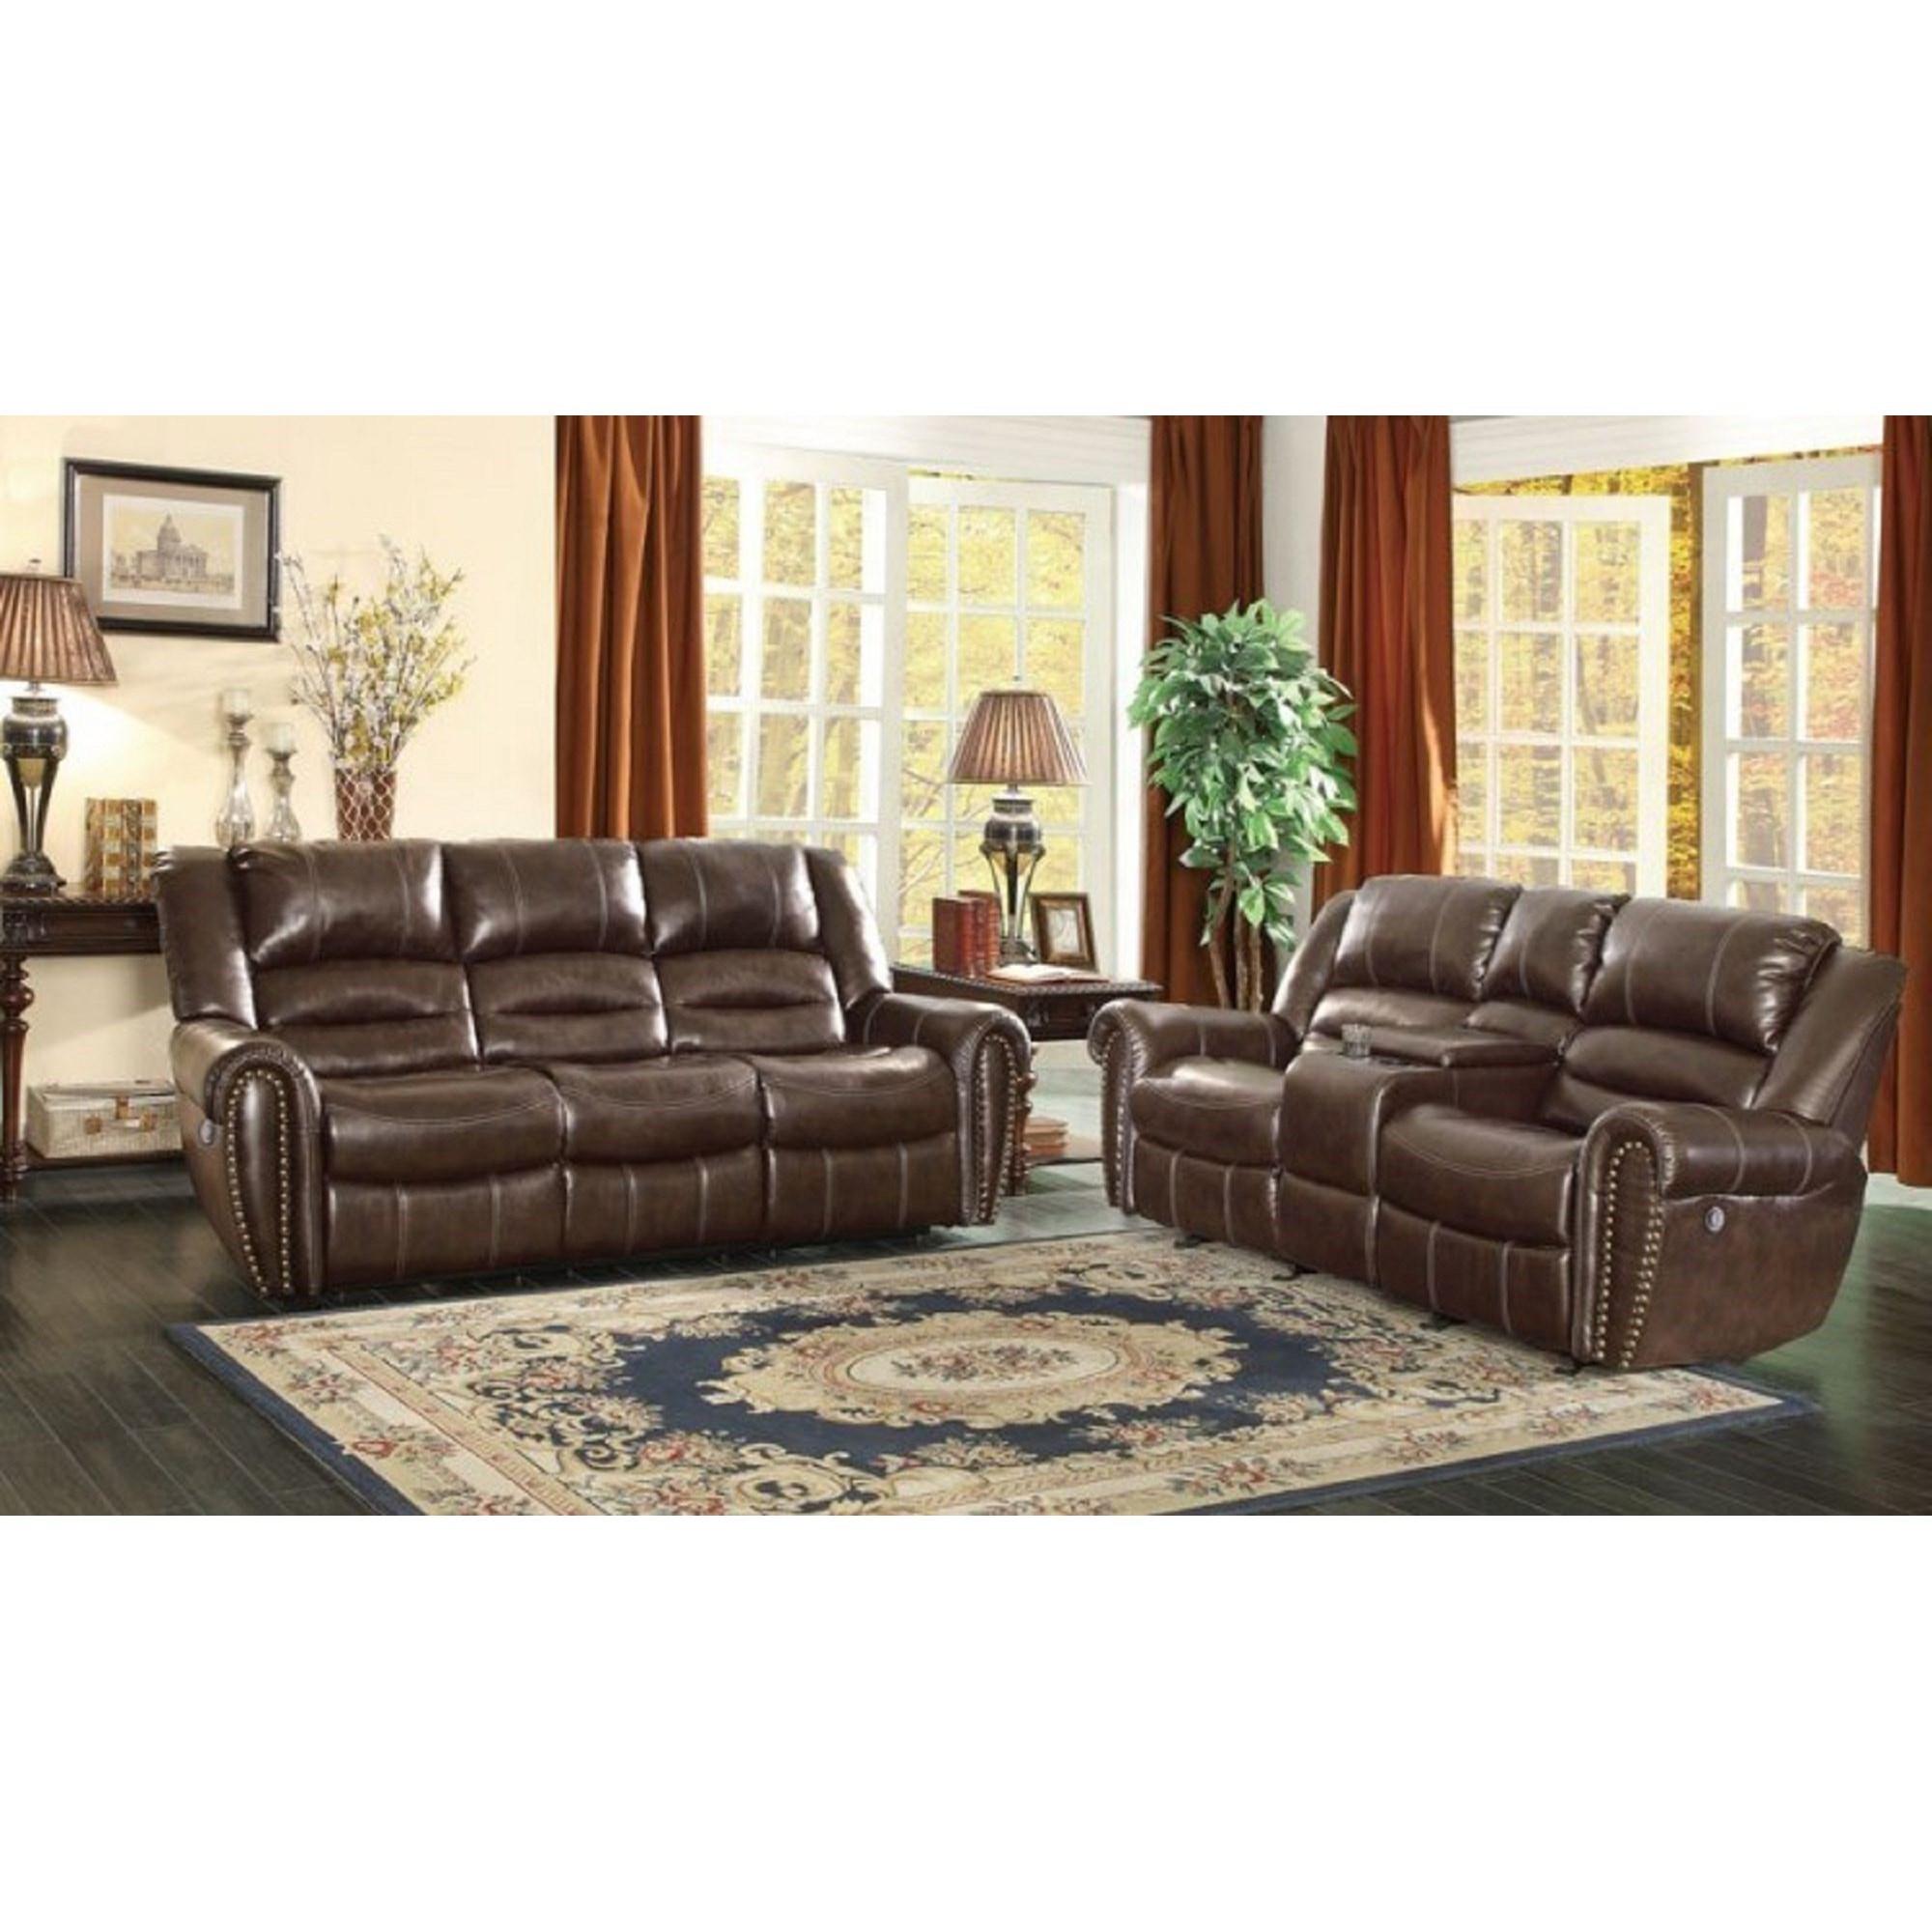 Homelegance Center Hill Power Reclining Living Room Group - Item Number: 9668 Living Room Group 1